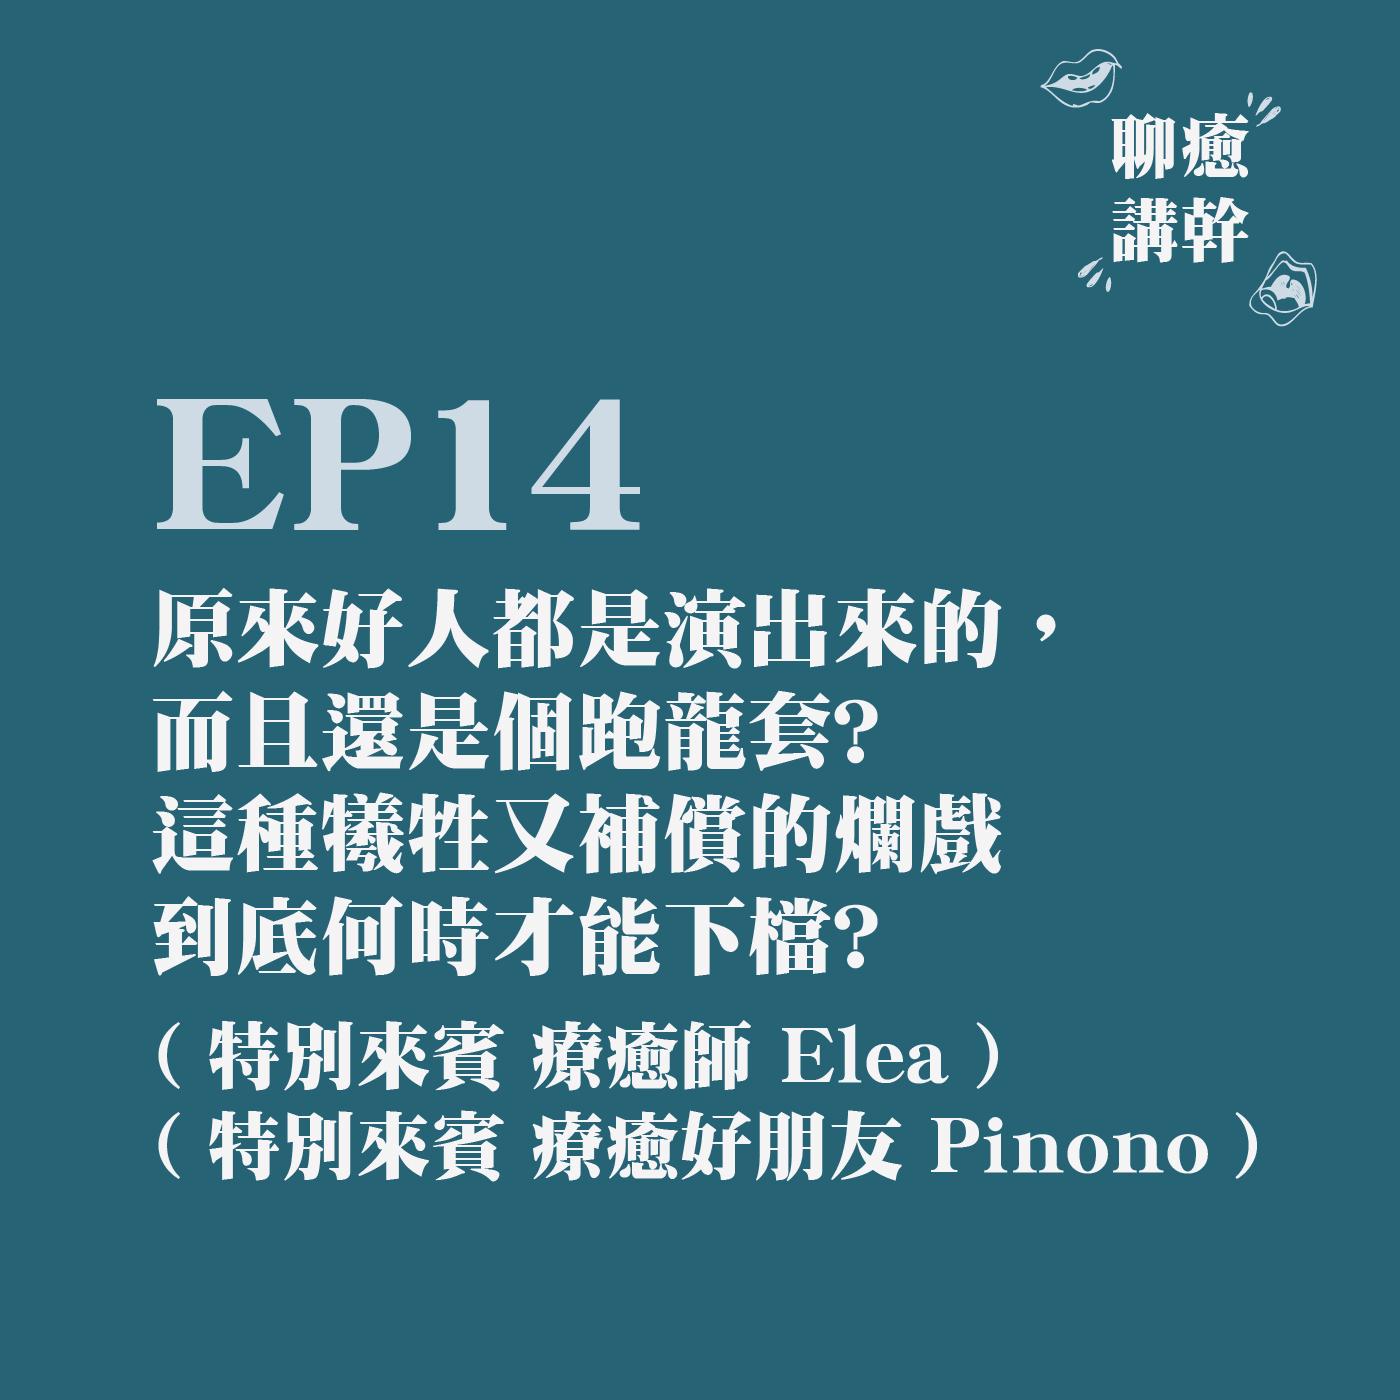 EP14 - 原來好人都是演出來的,而且還是個跑龍套? 這種犧牲又補償的爛戲到底何時才能下檔? feat. Elea & Pinono